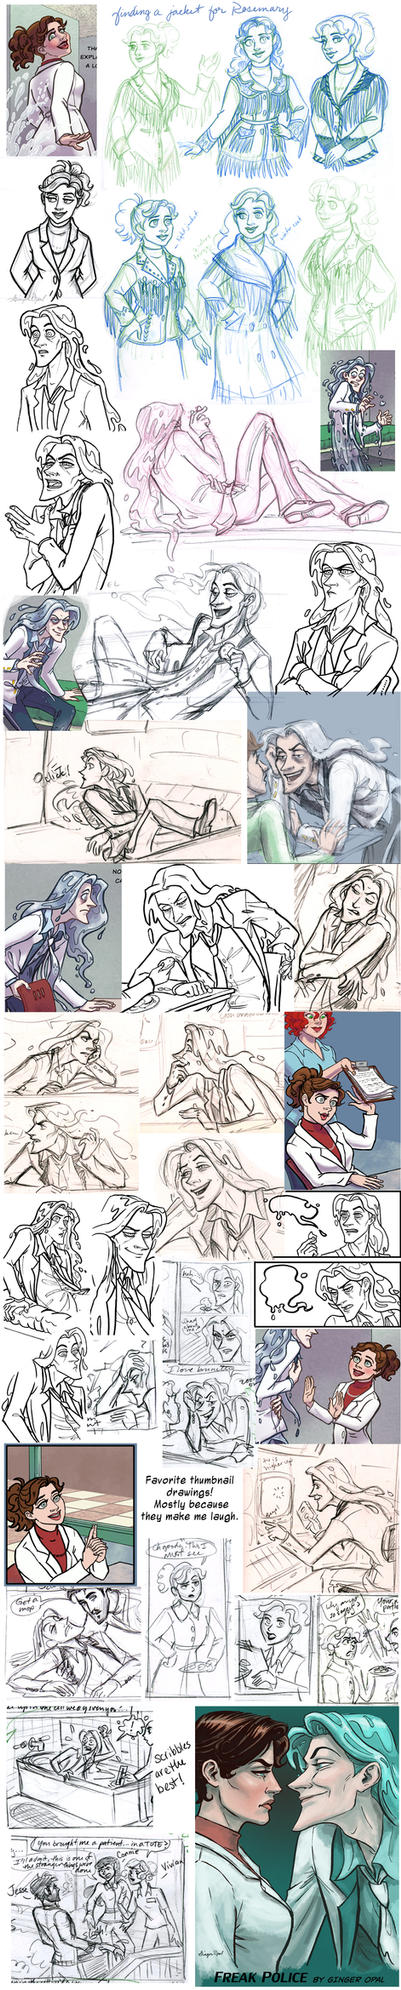 Jeremiah/Rosemary Comic Sketchdump by GingerOpal